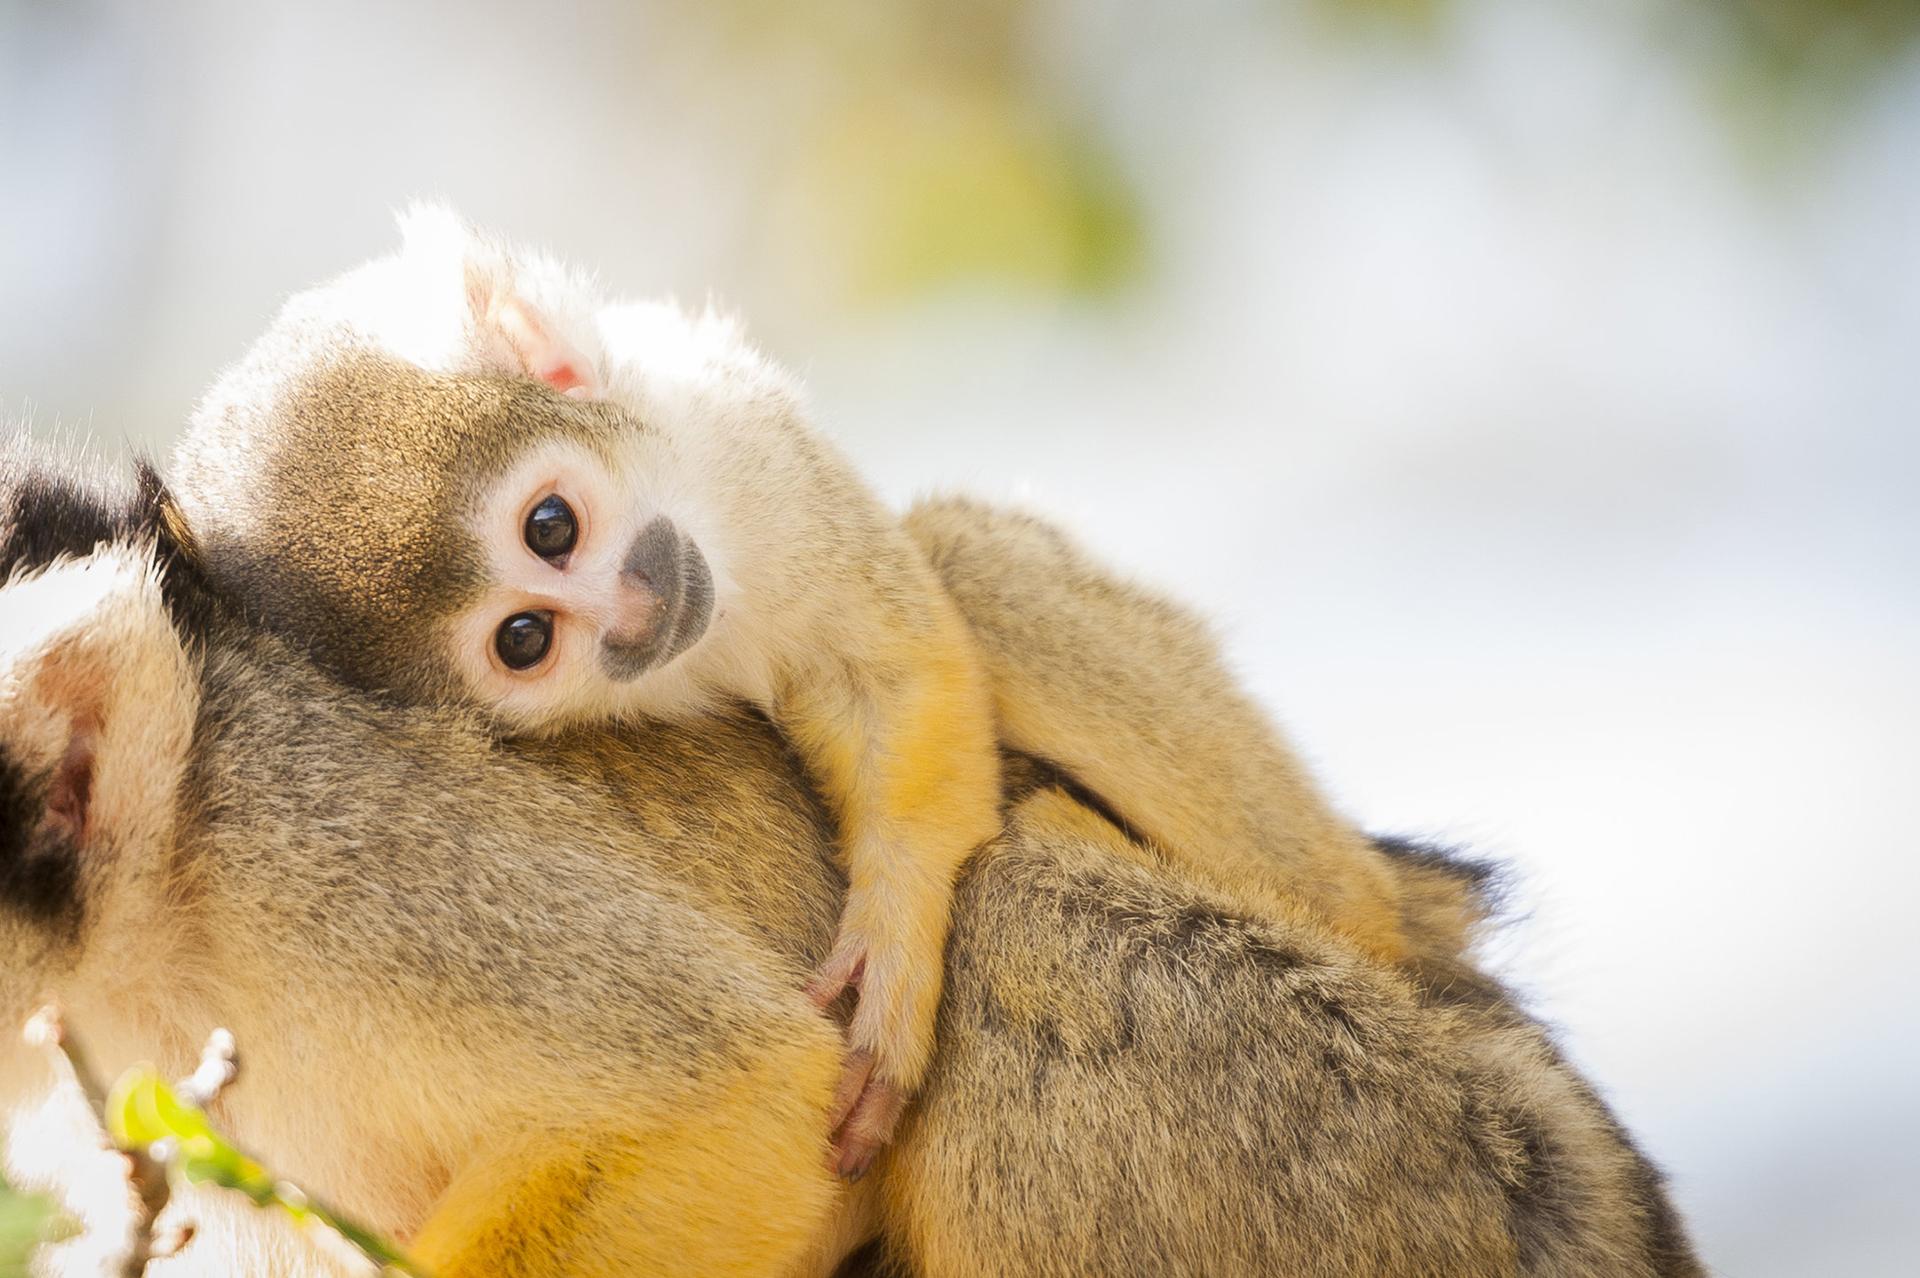 Baby monkey background wallpaper x